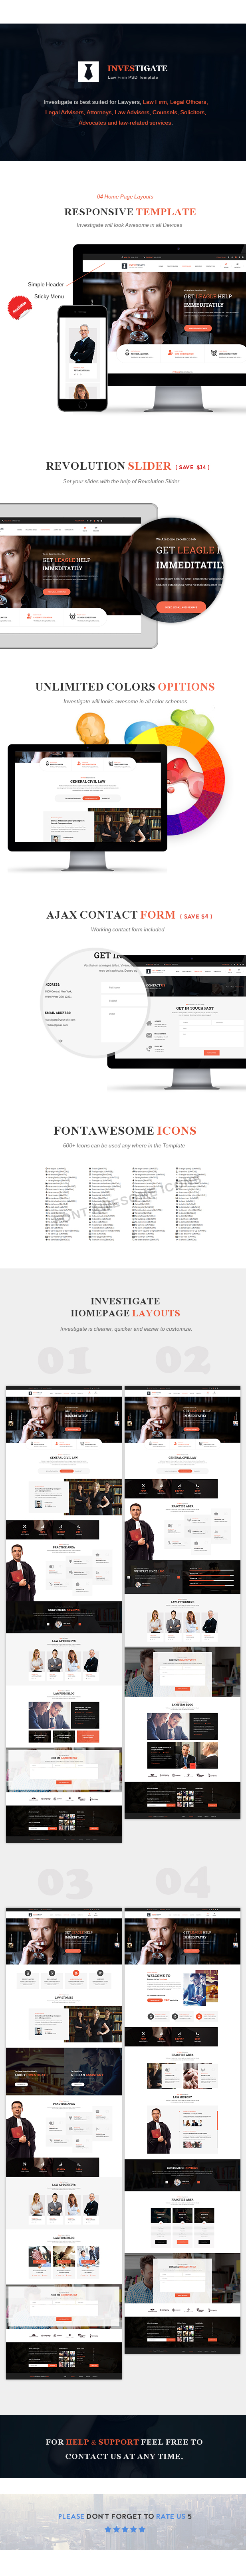 Investigate_HTML_Presentation